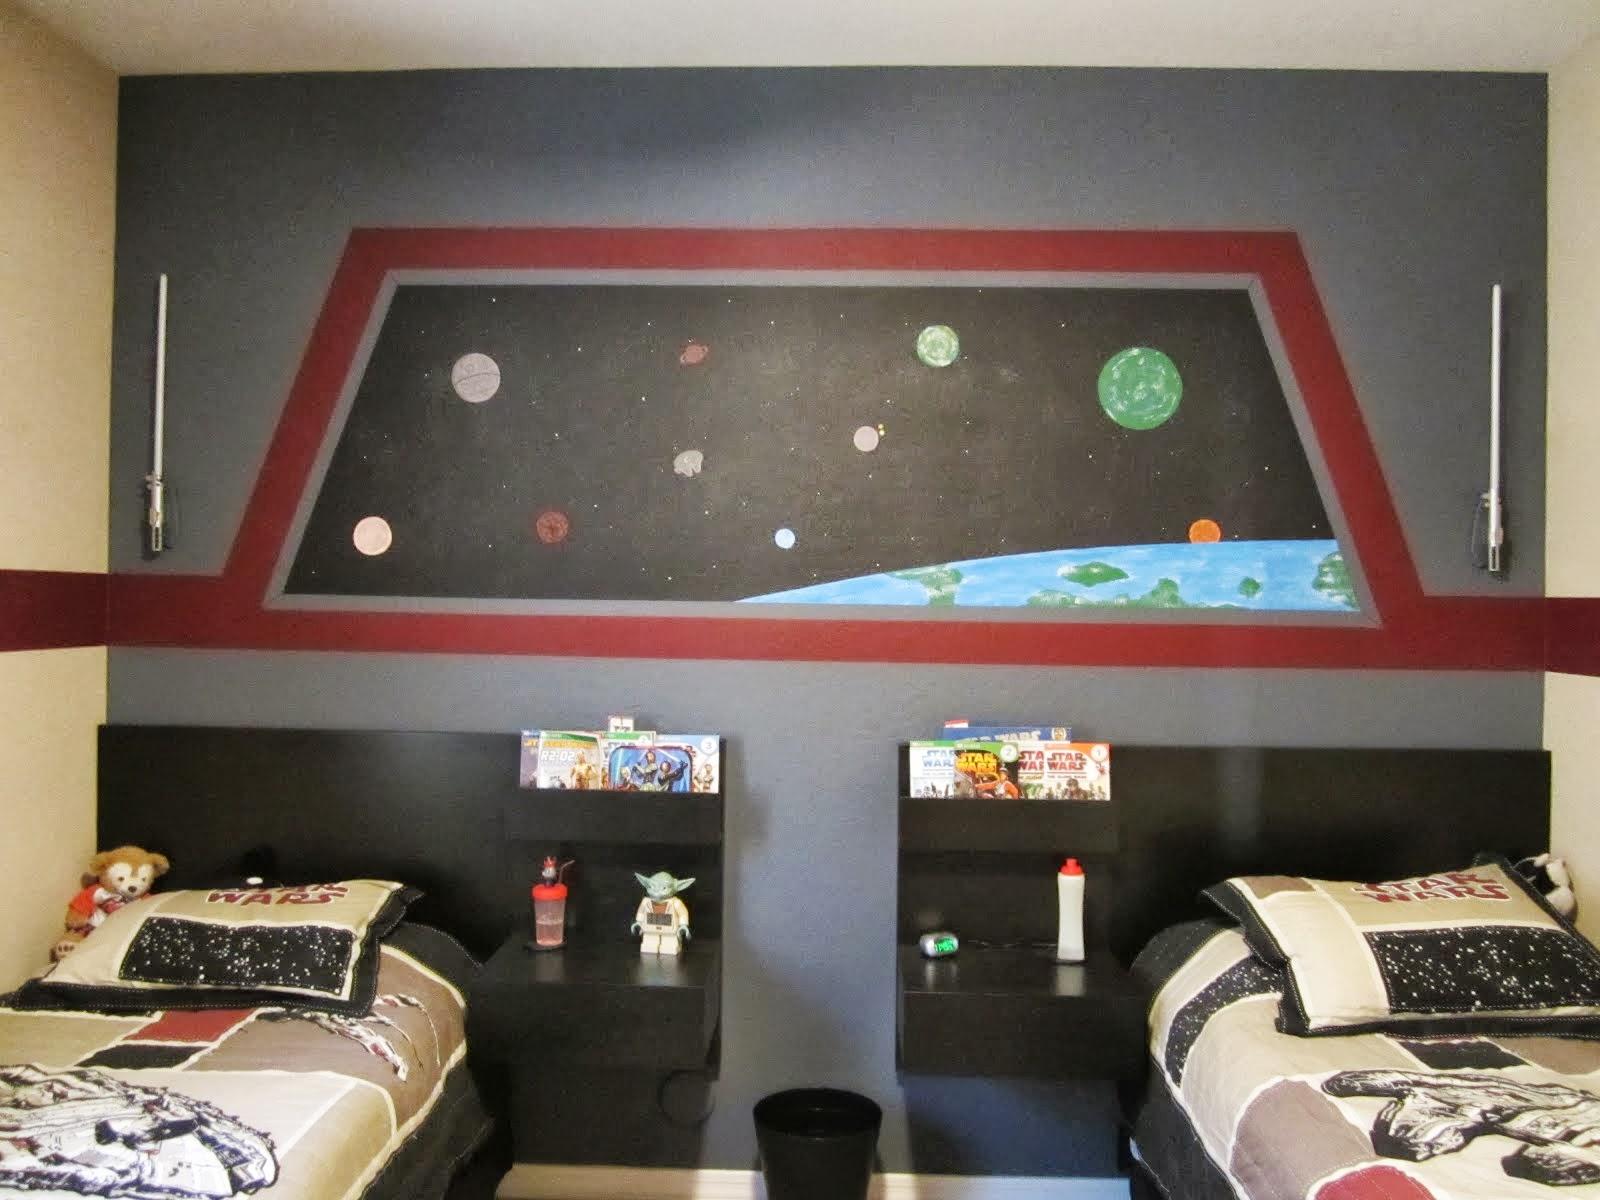 floating star wars beds m=0